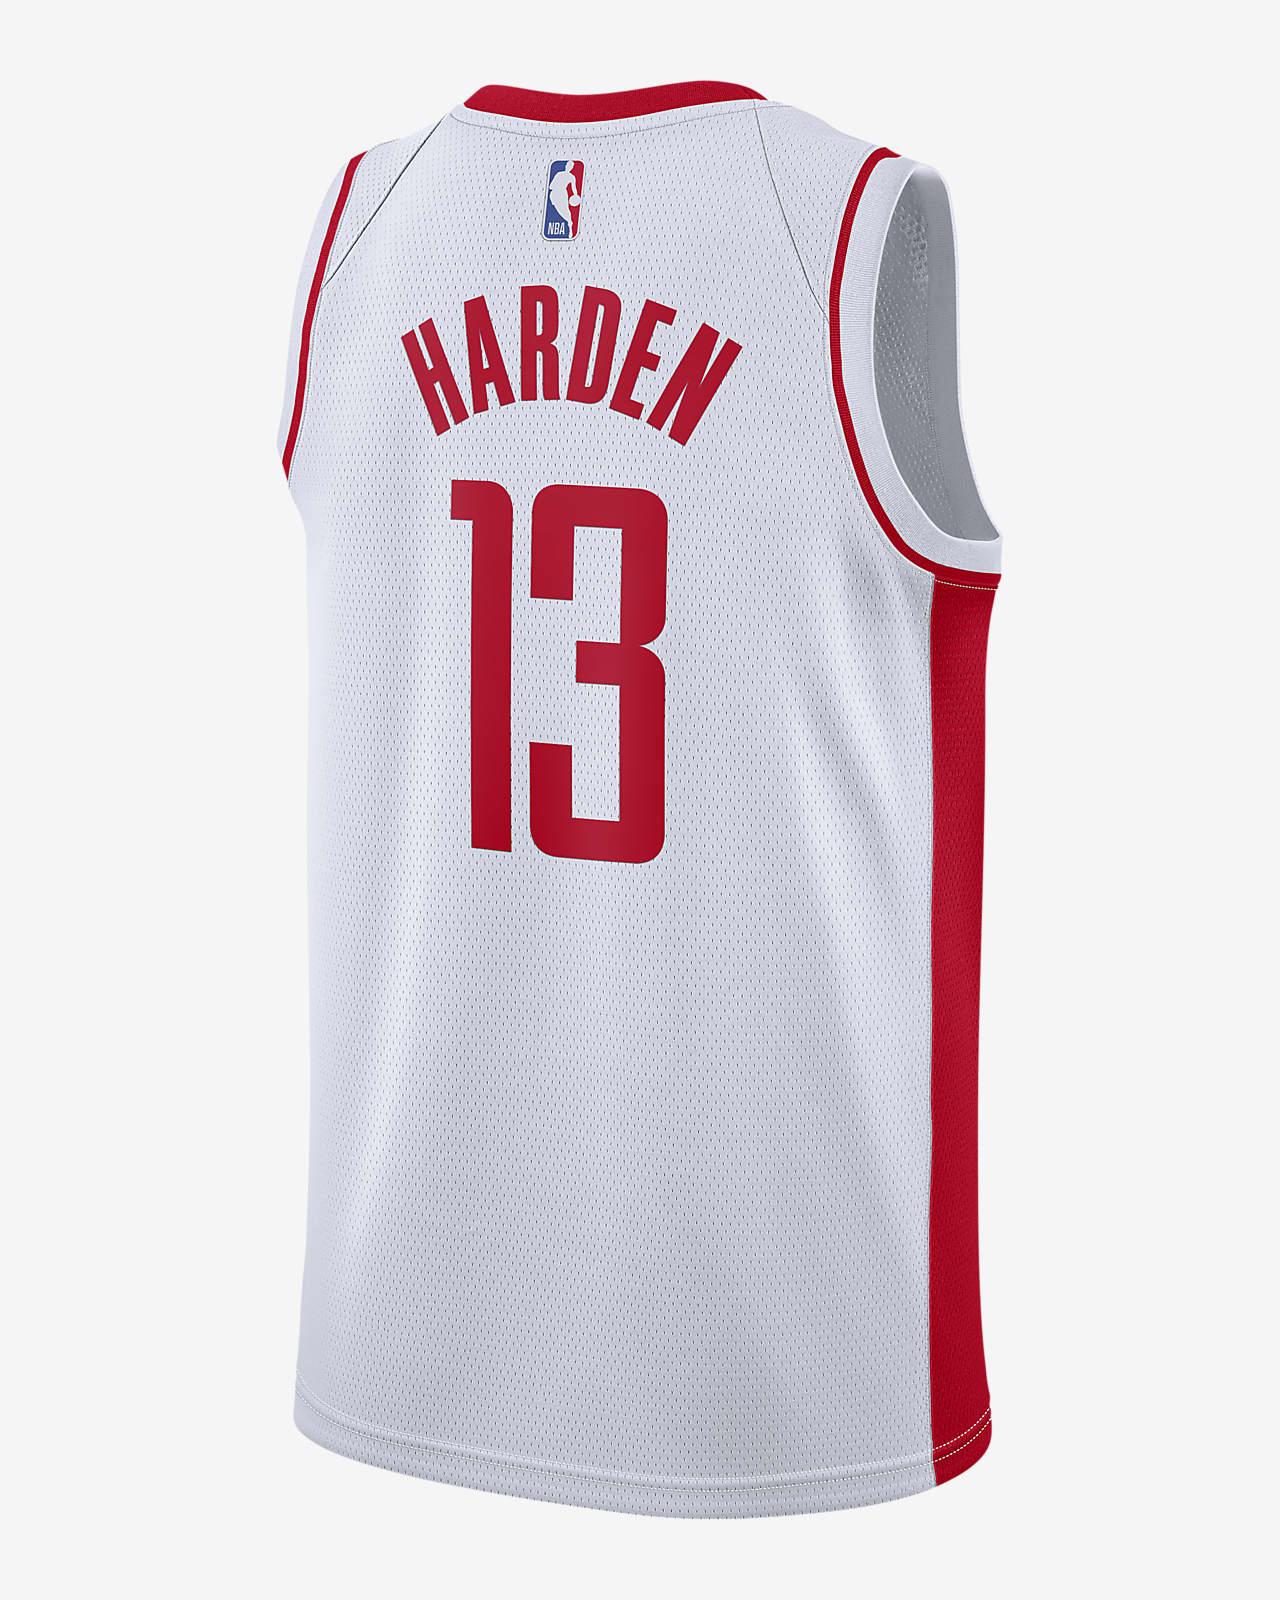 Nevada Sudán Alaska  James Harden Rockets Association Edition 2020 Nike NBA Swingman Jersey. Nike  ZA